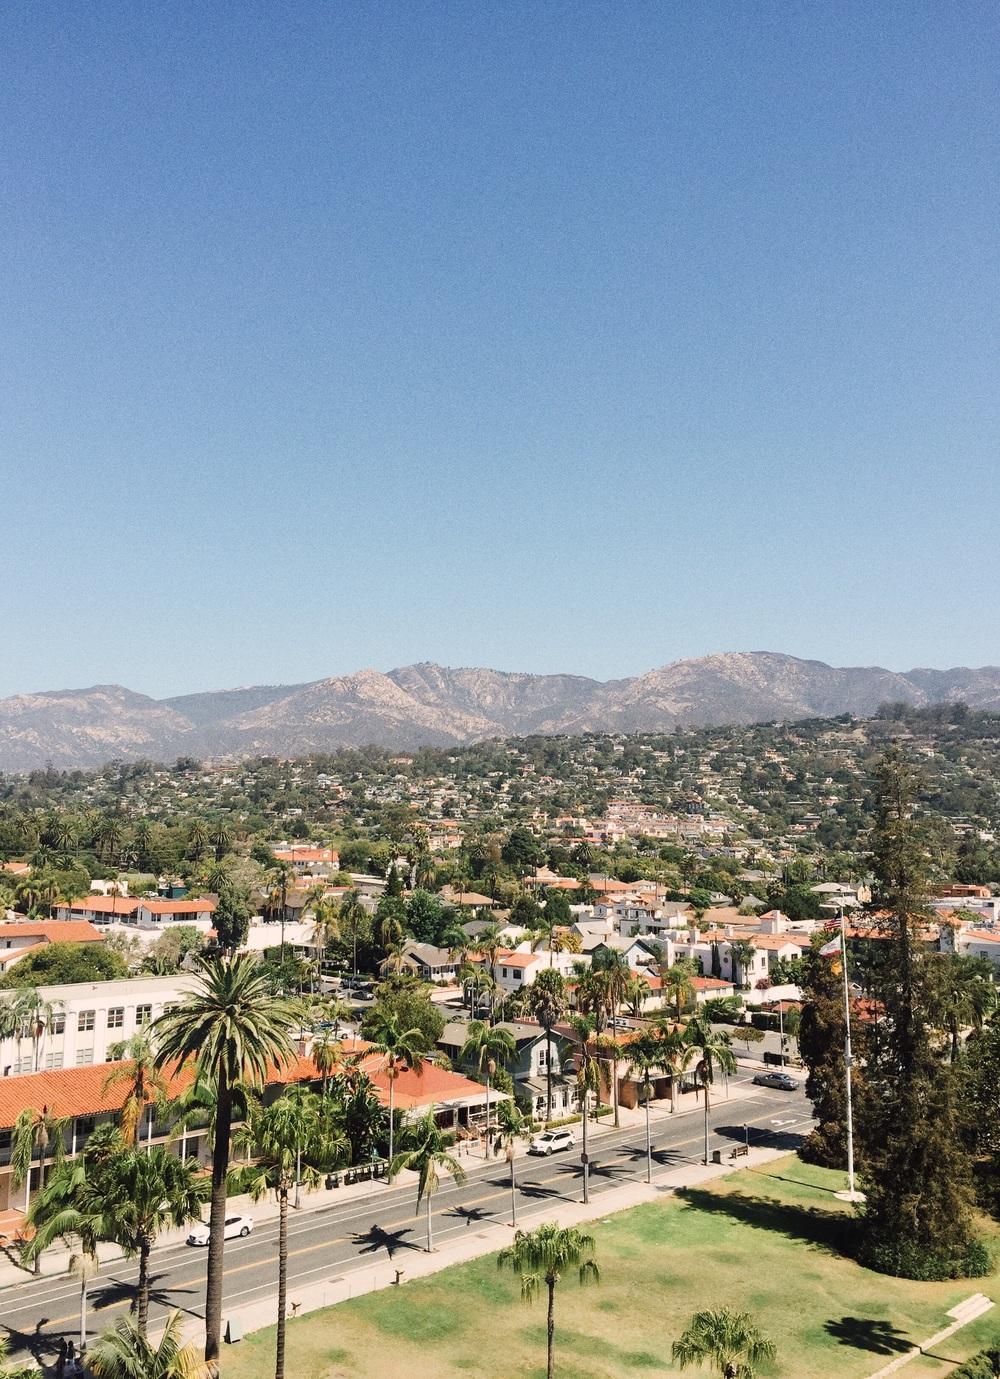 Santa Barbara, August '15